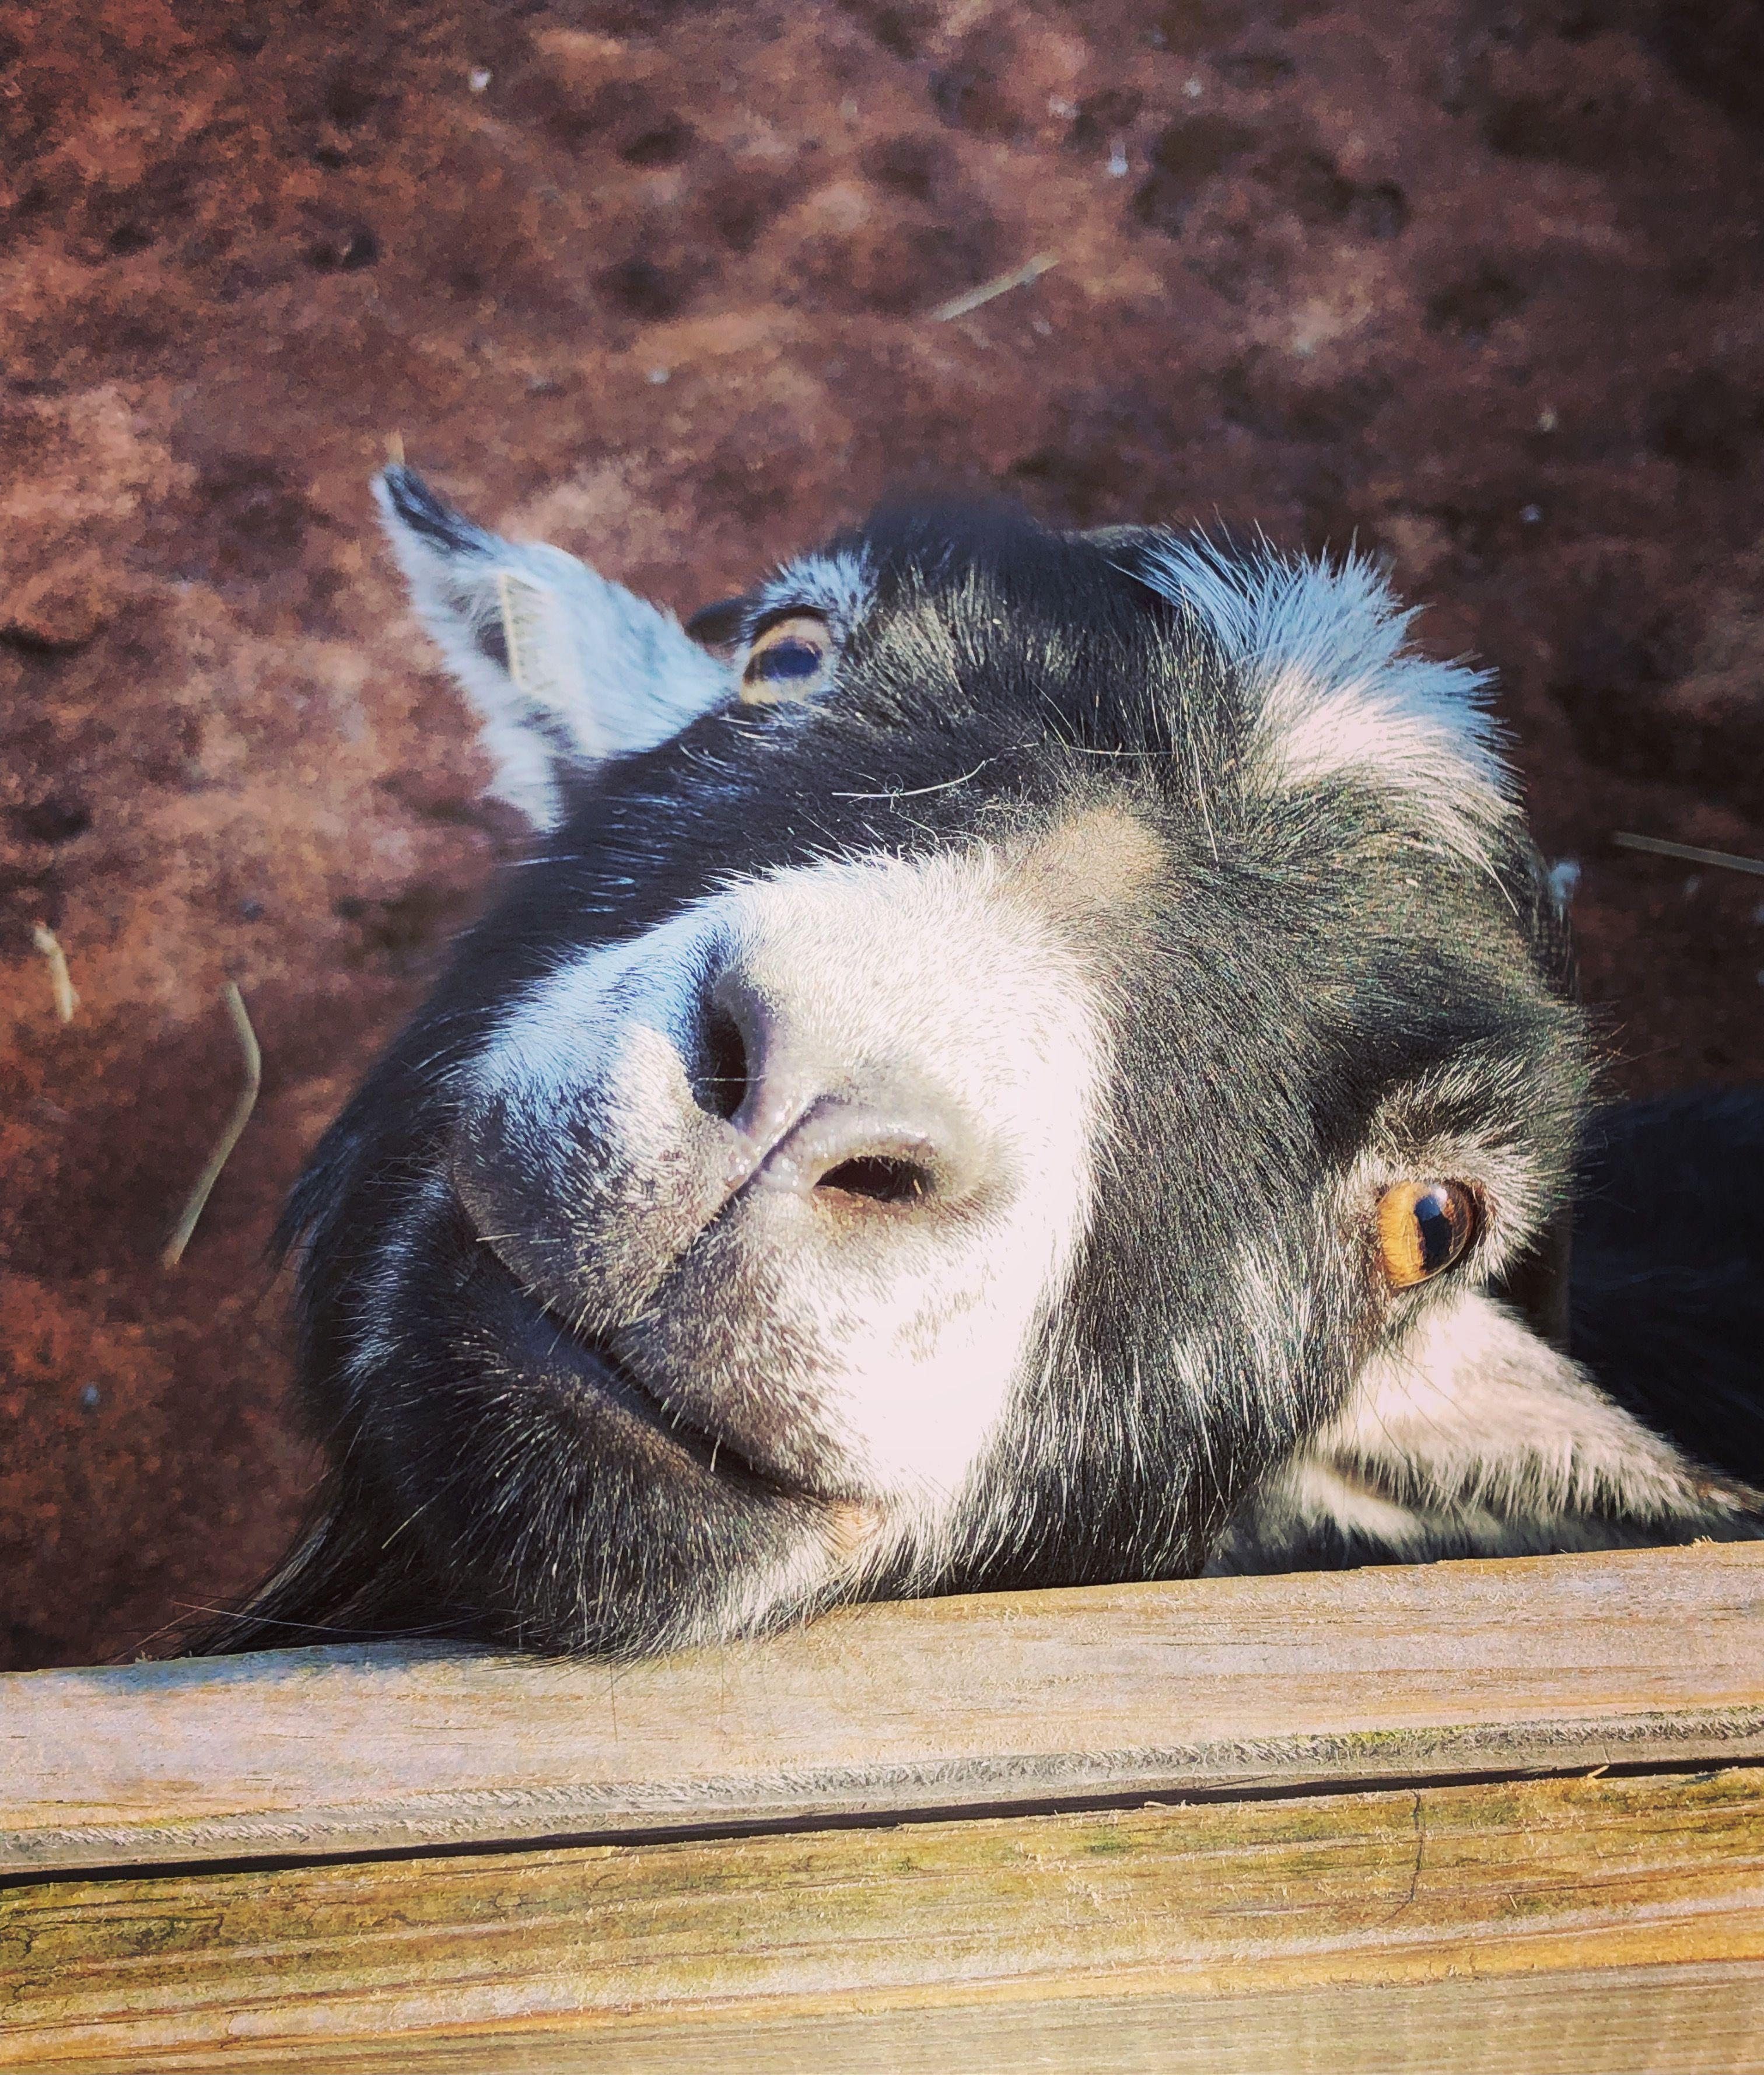 15+ Austin zoo animal crackers images